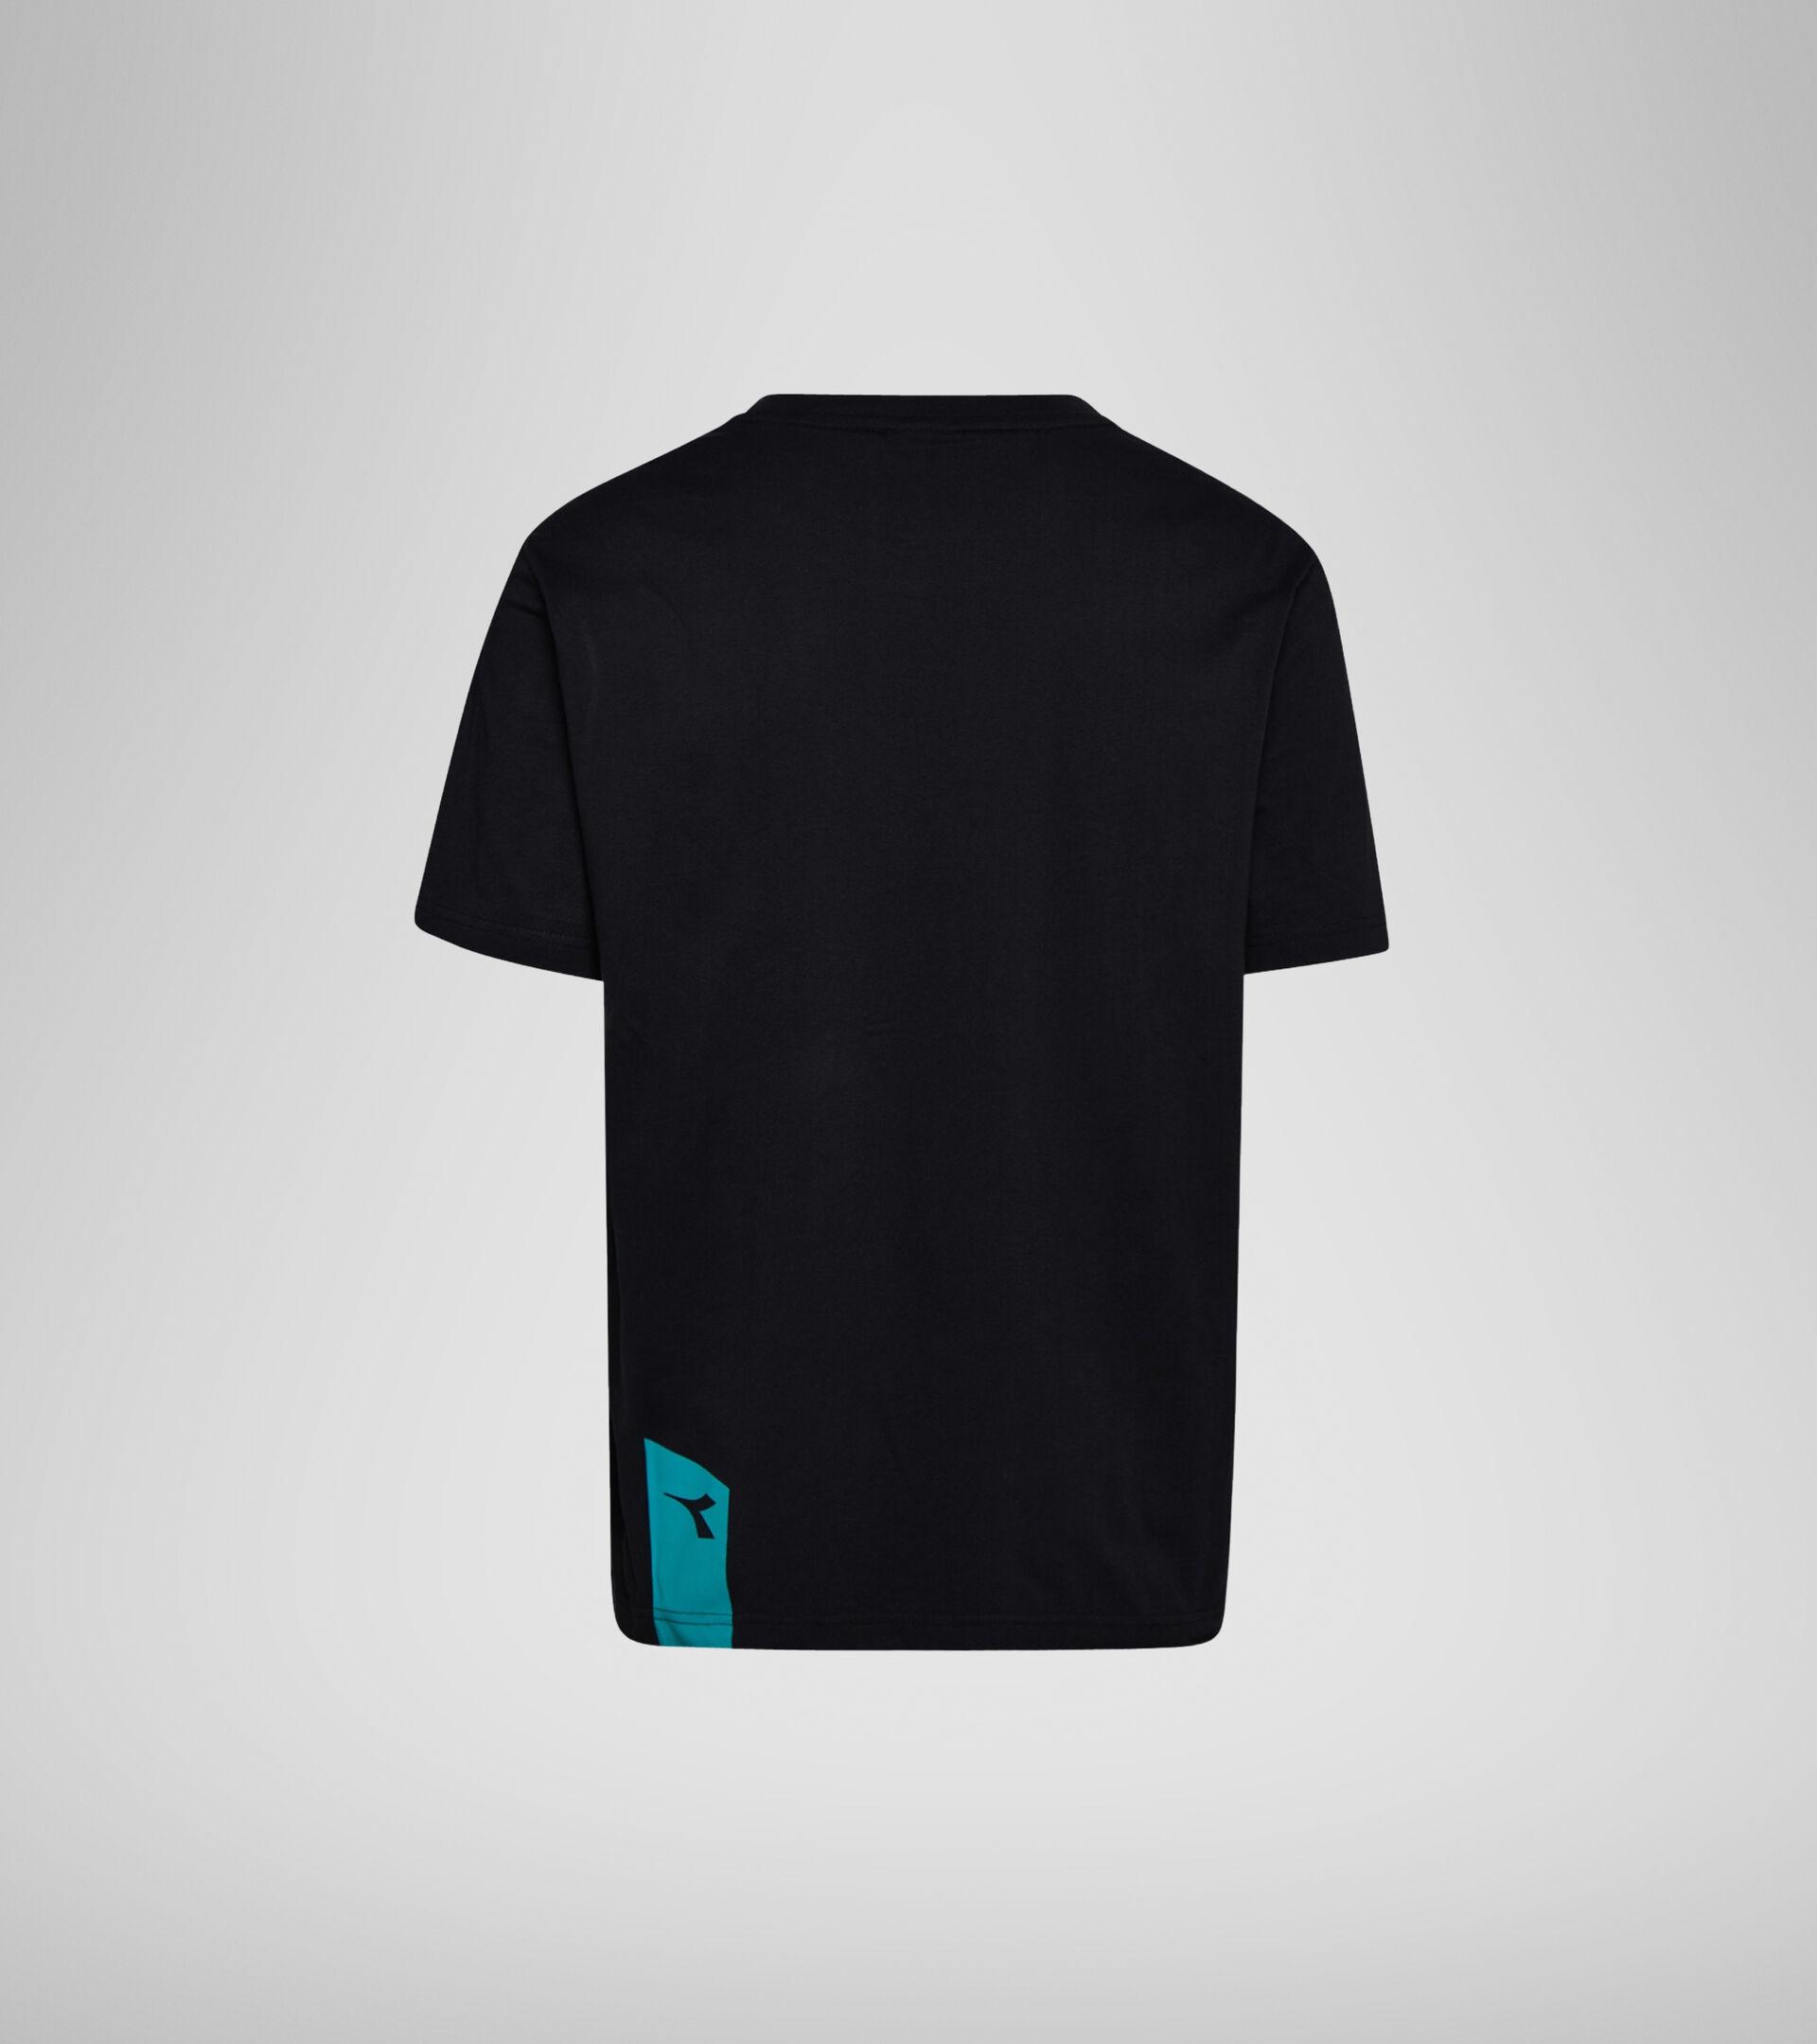 T-shirt - Unisex T-SHIRT SS ICON SCHWARZ - Diadora